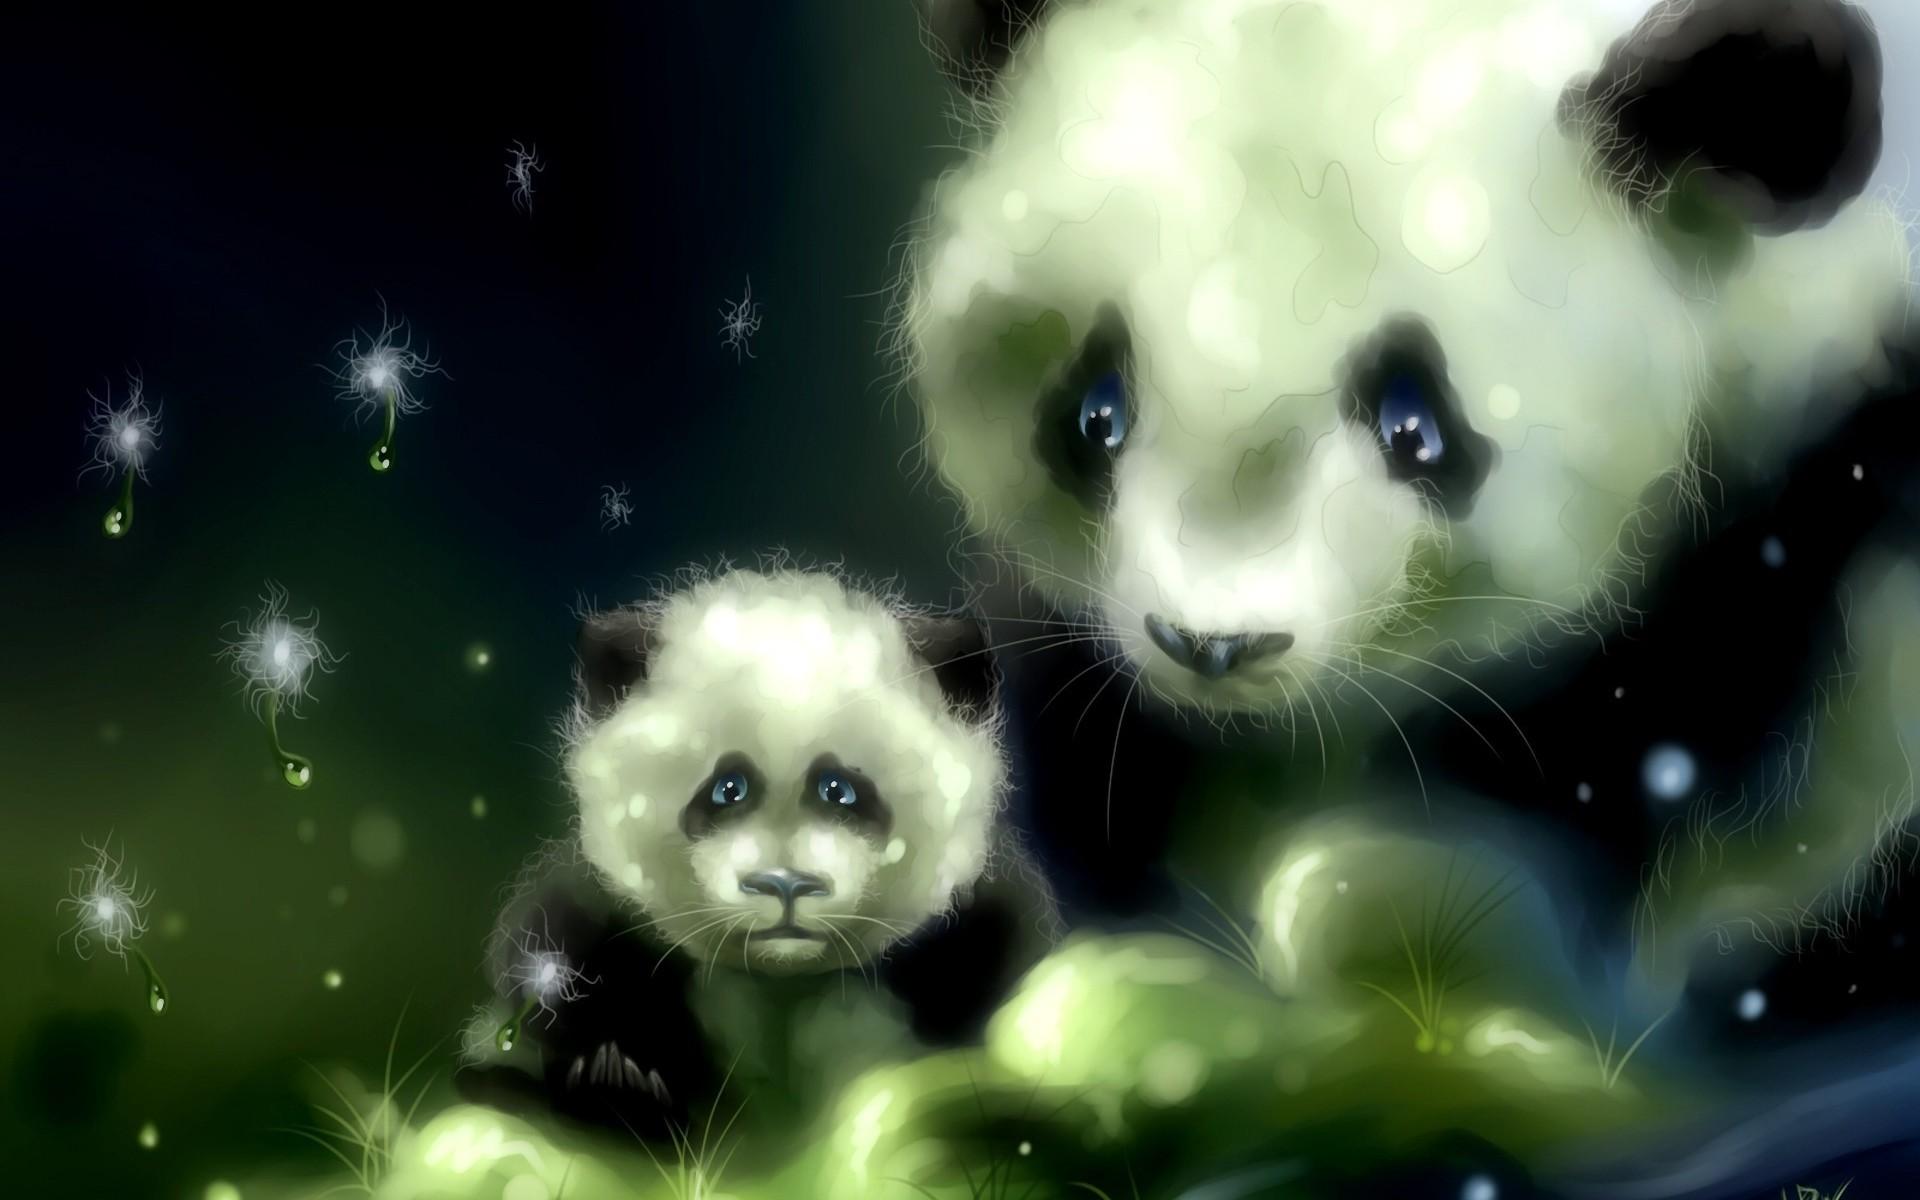 Free Download Art Panda Bears Babies Cute Wallpaper 1920x1200 39807 1920x1200 For Your Desktop Mobile Tablet Explore 49 Kawaii Panda Wallpaper Cute Panda Wallpapers Cartoon Panda Wallpaper Panda Bear Wallpaper